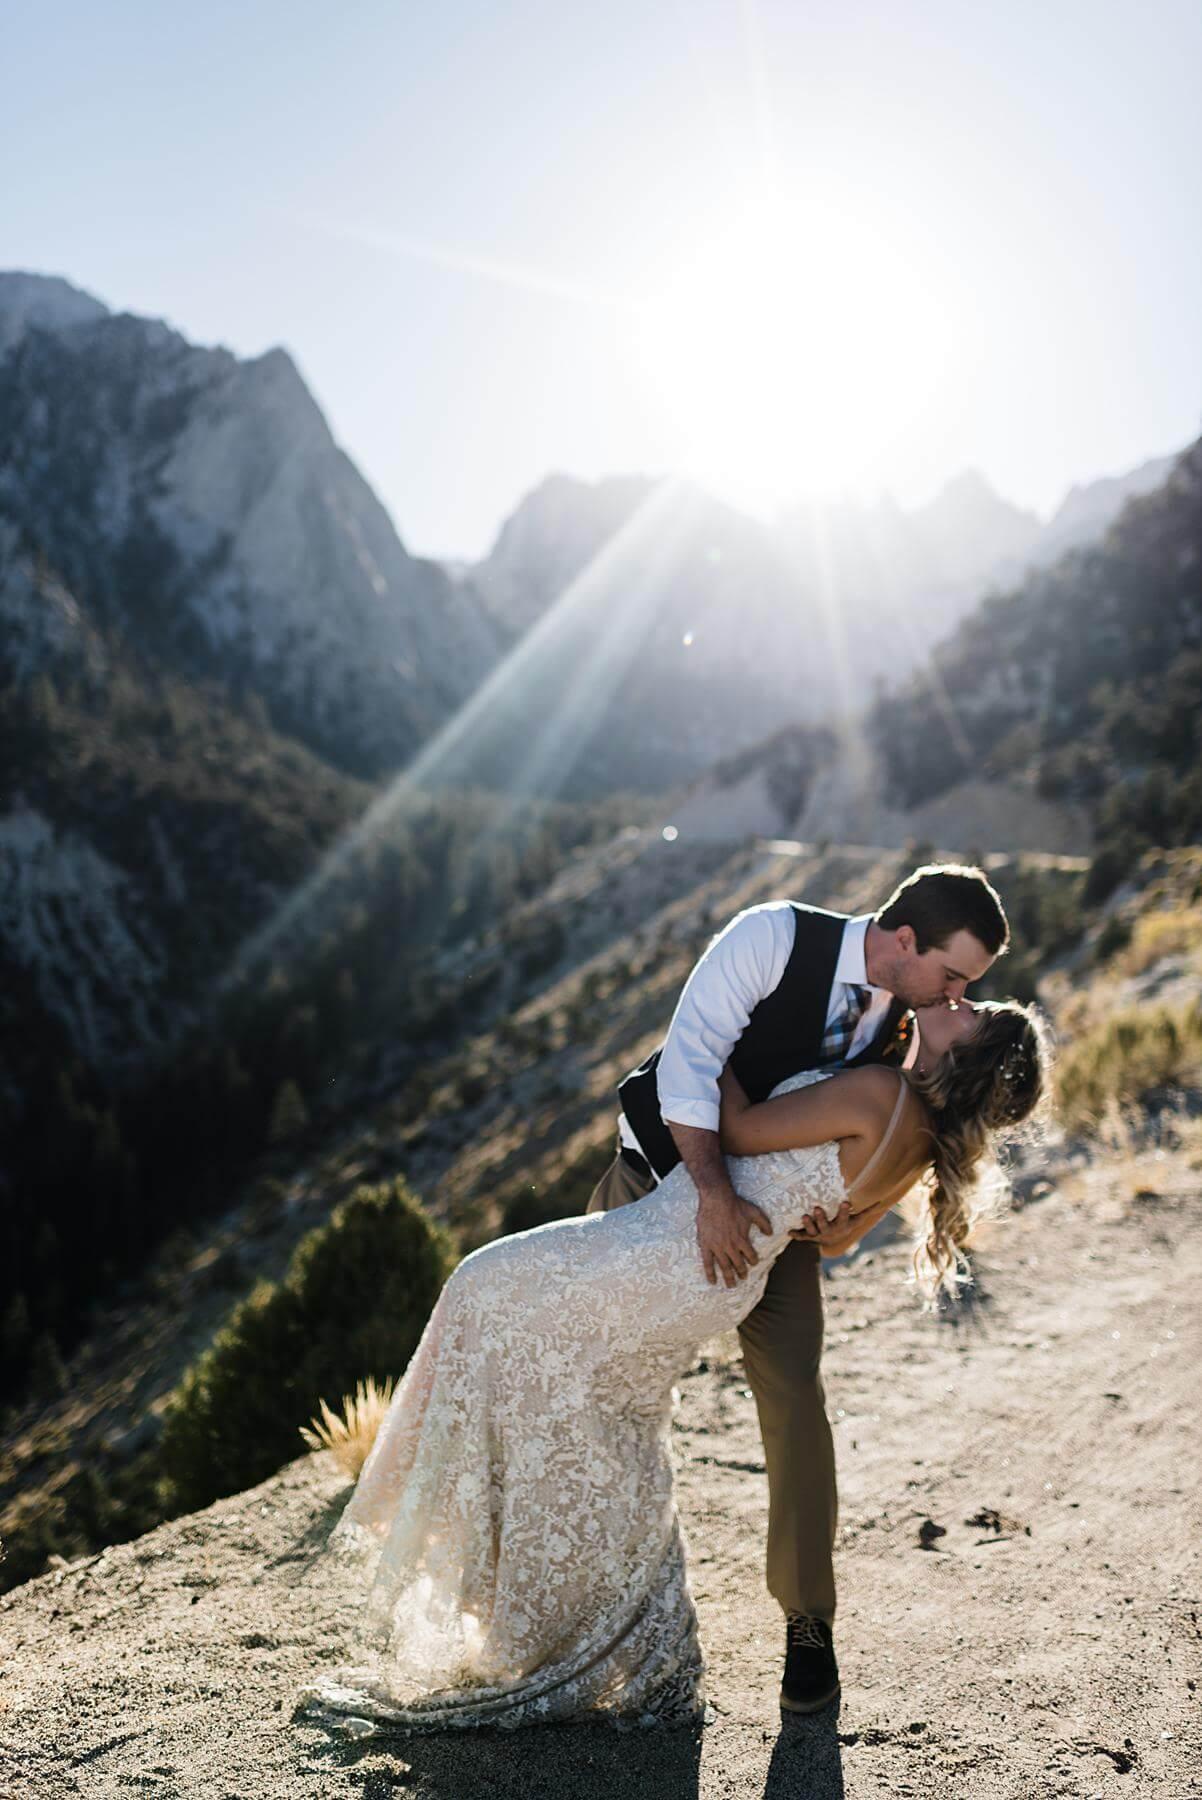 S Photography,adventure,alabama hills,boho,desert,elopement,indie,intimate wedding,lone pine,mobius arch,wedding,whitney portal,